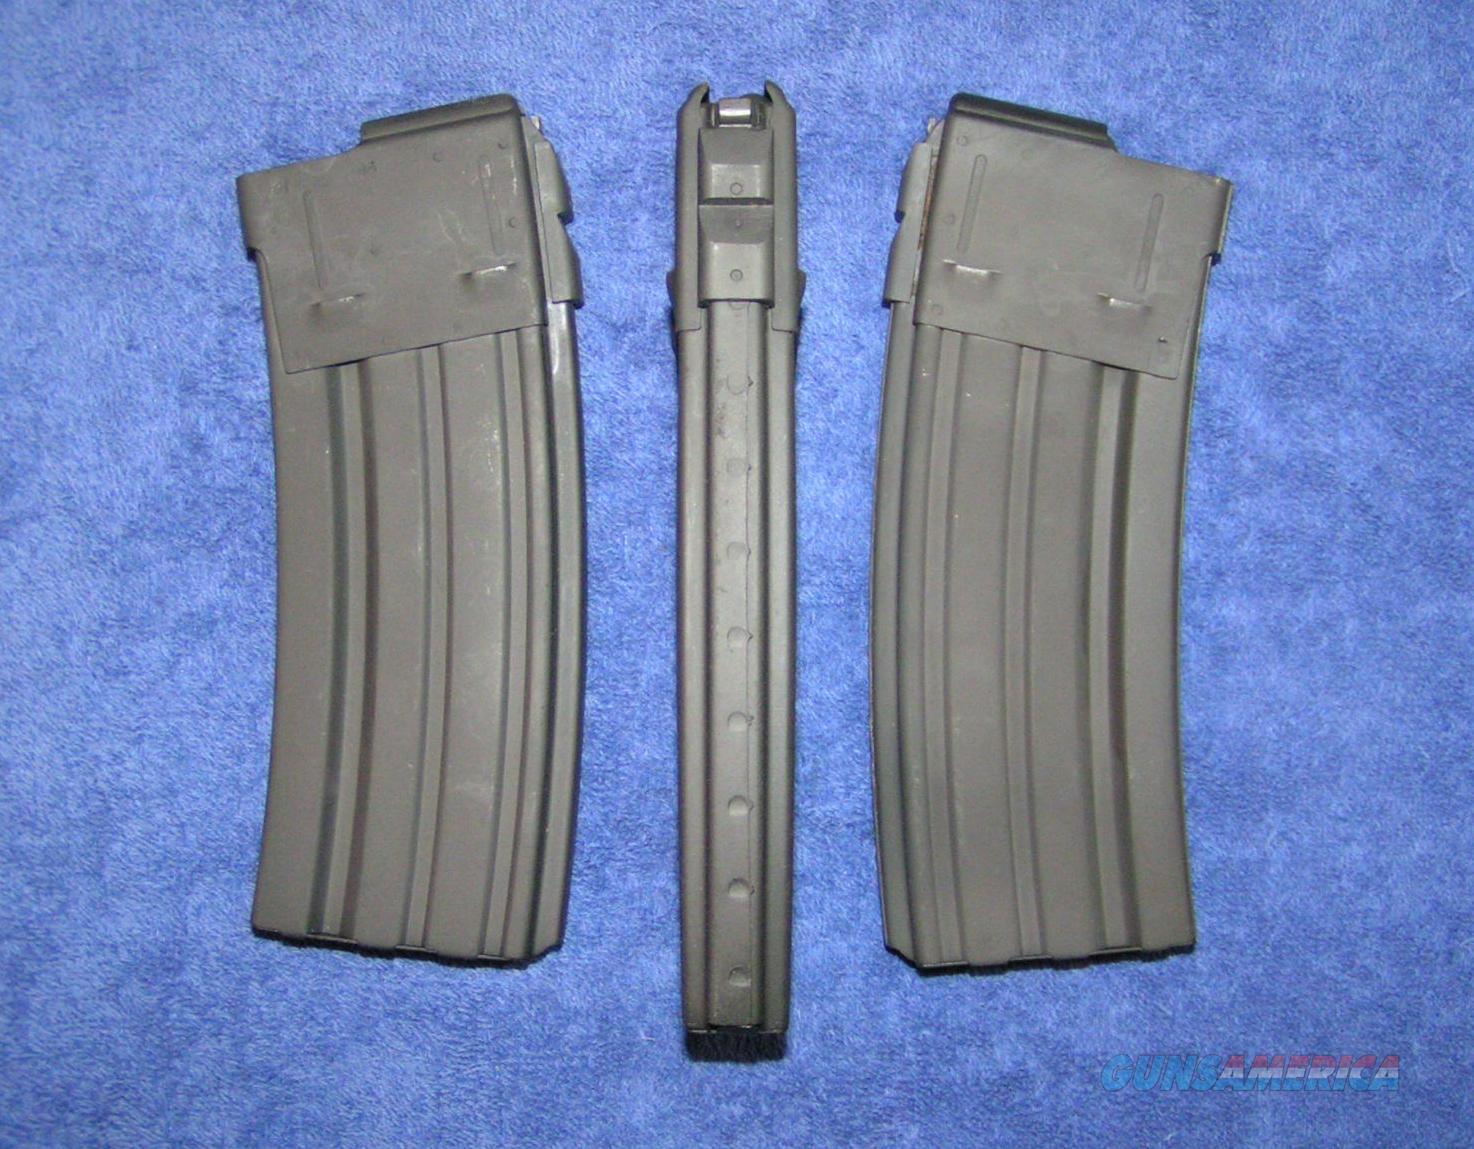 3 Beretta AR70 mags 30 round .223 used excelent  Non-Guns > Magazines & Clips > Pistol Magazines > Beretta